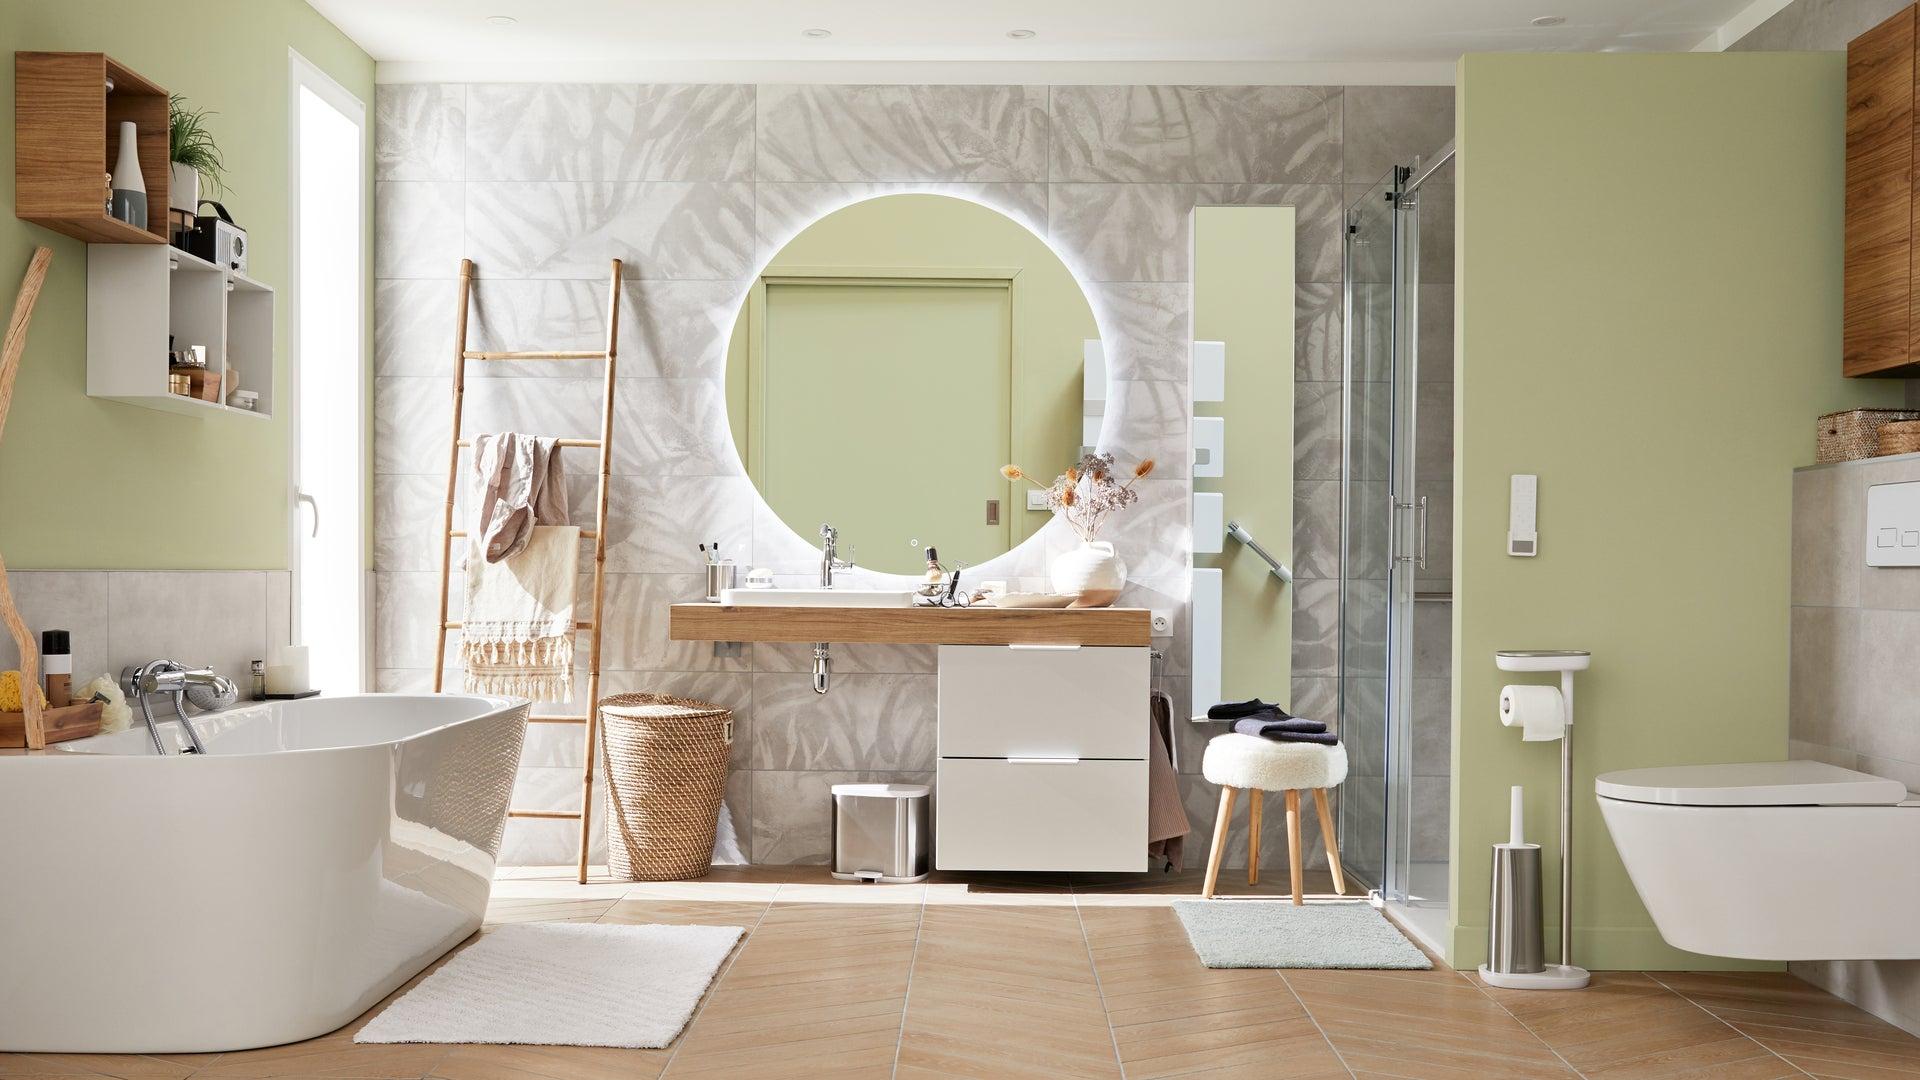 Fresh Miroir Salle De Bain Leroy Merlin Led